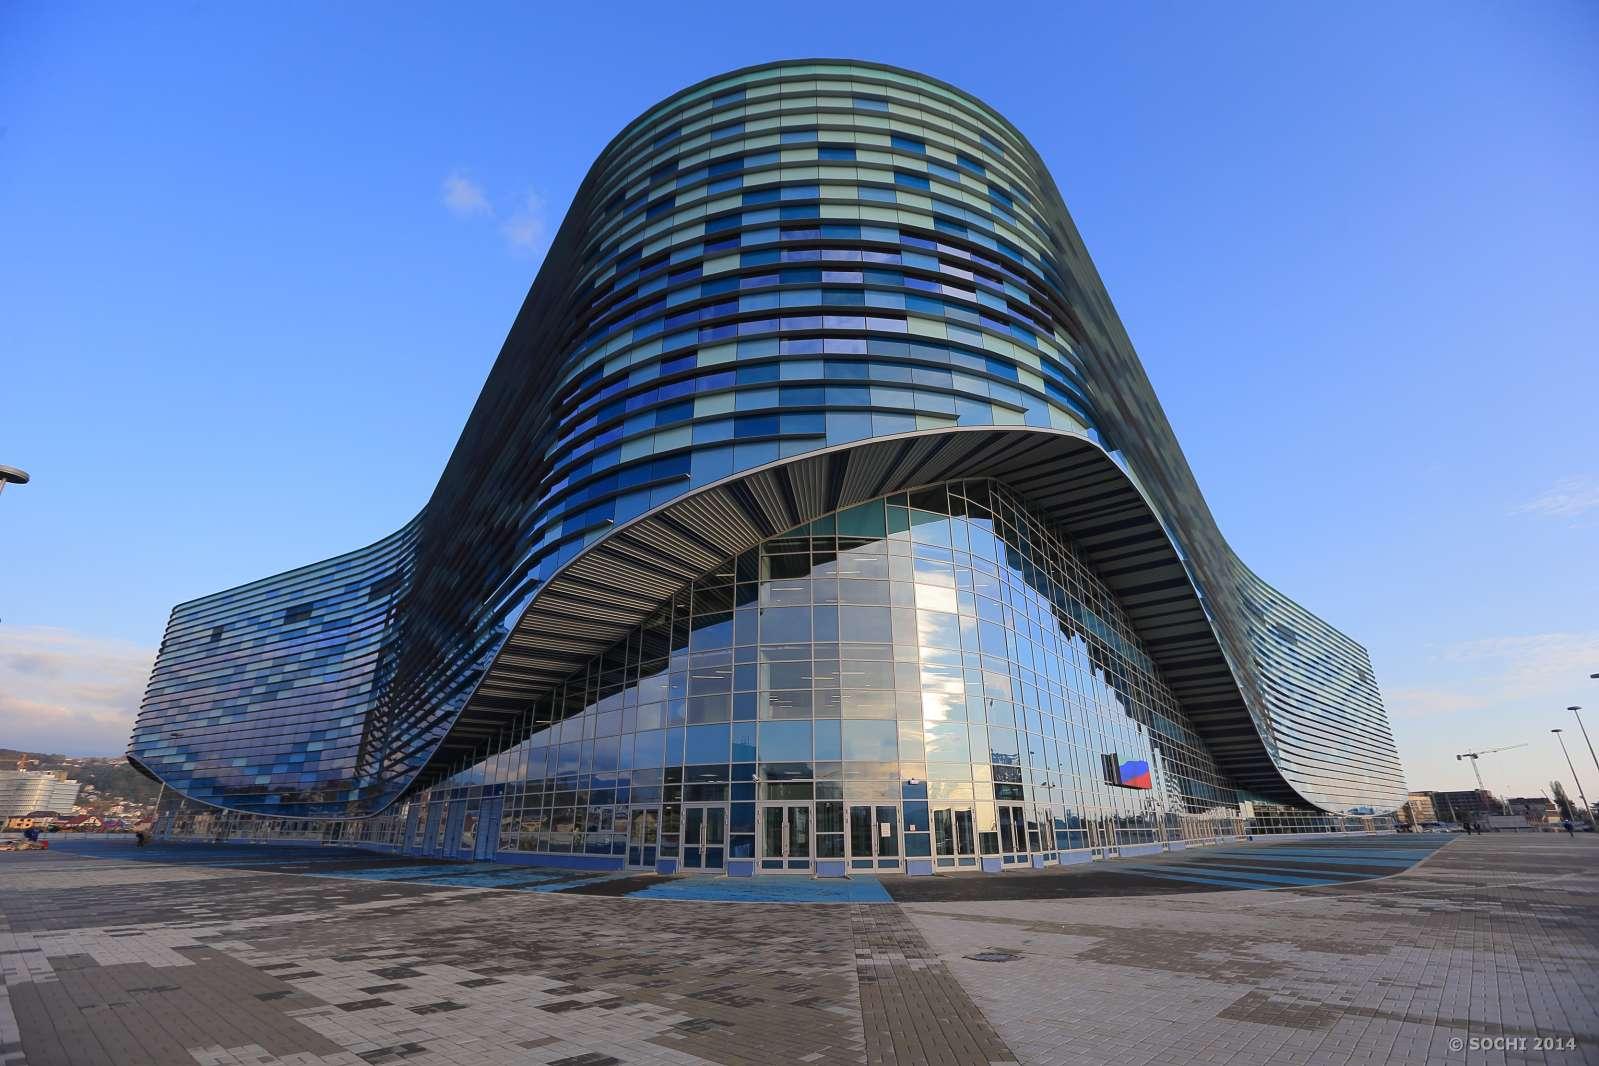 11-Sochi-2014-Olympics-Architecture-Iceberg-Skating-Palace